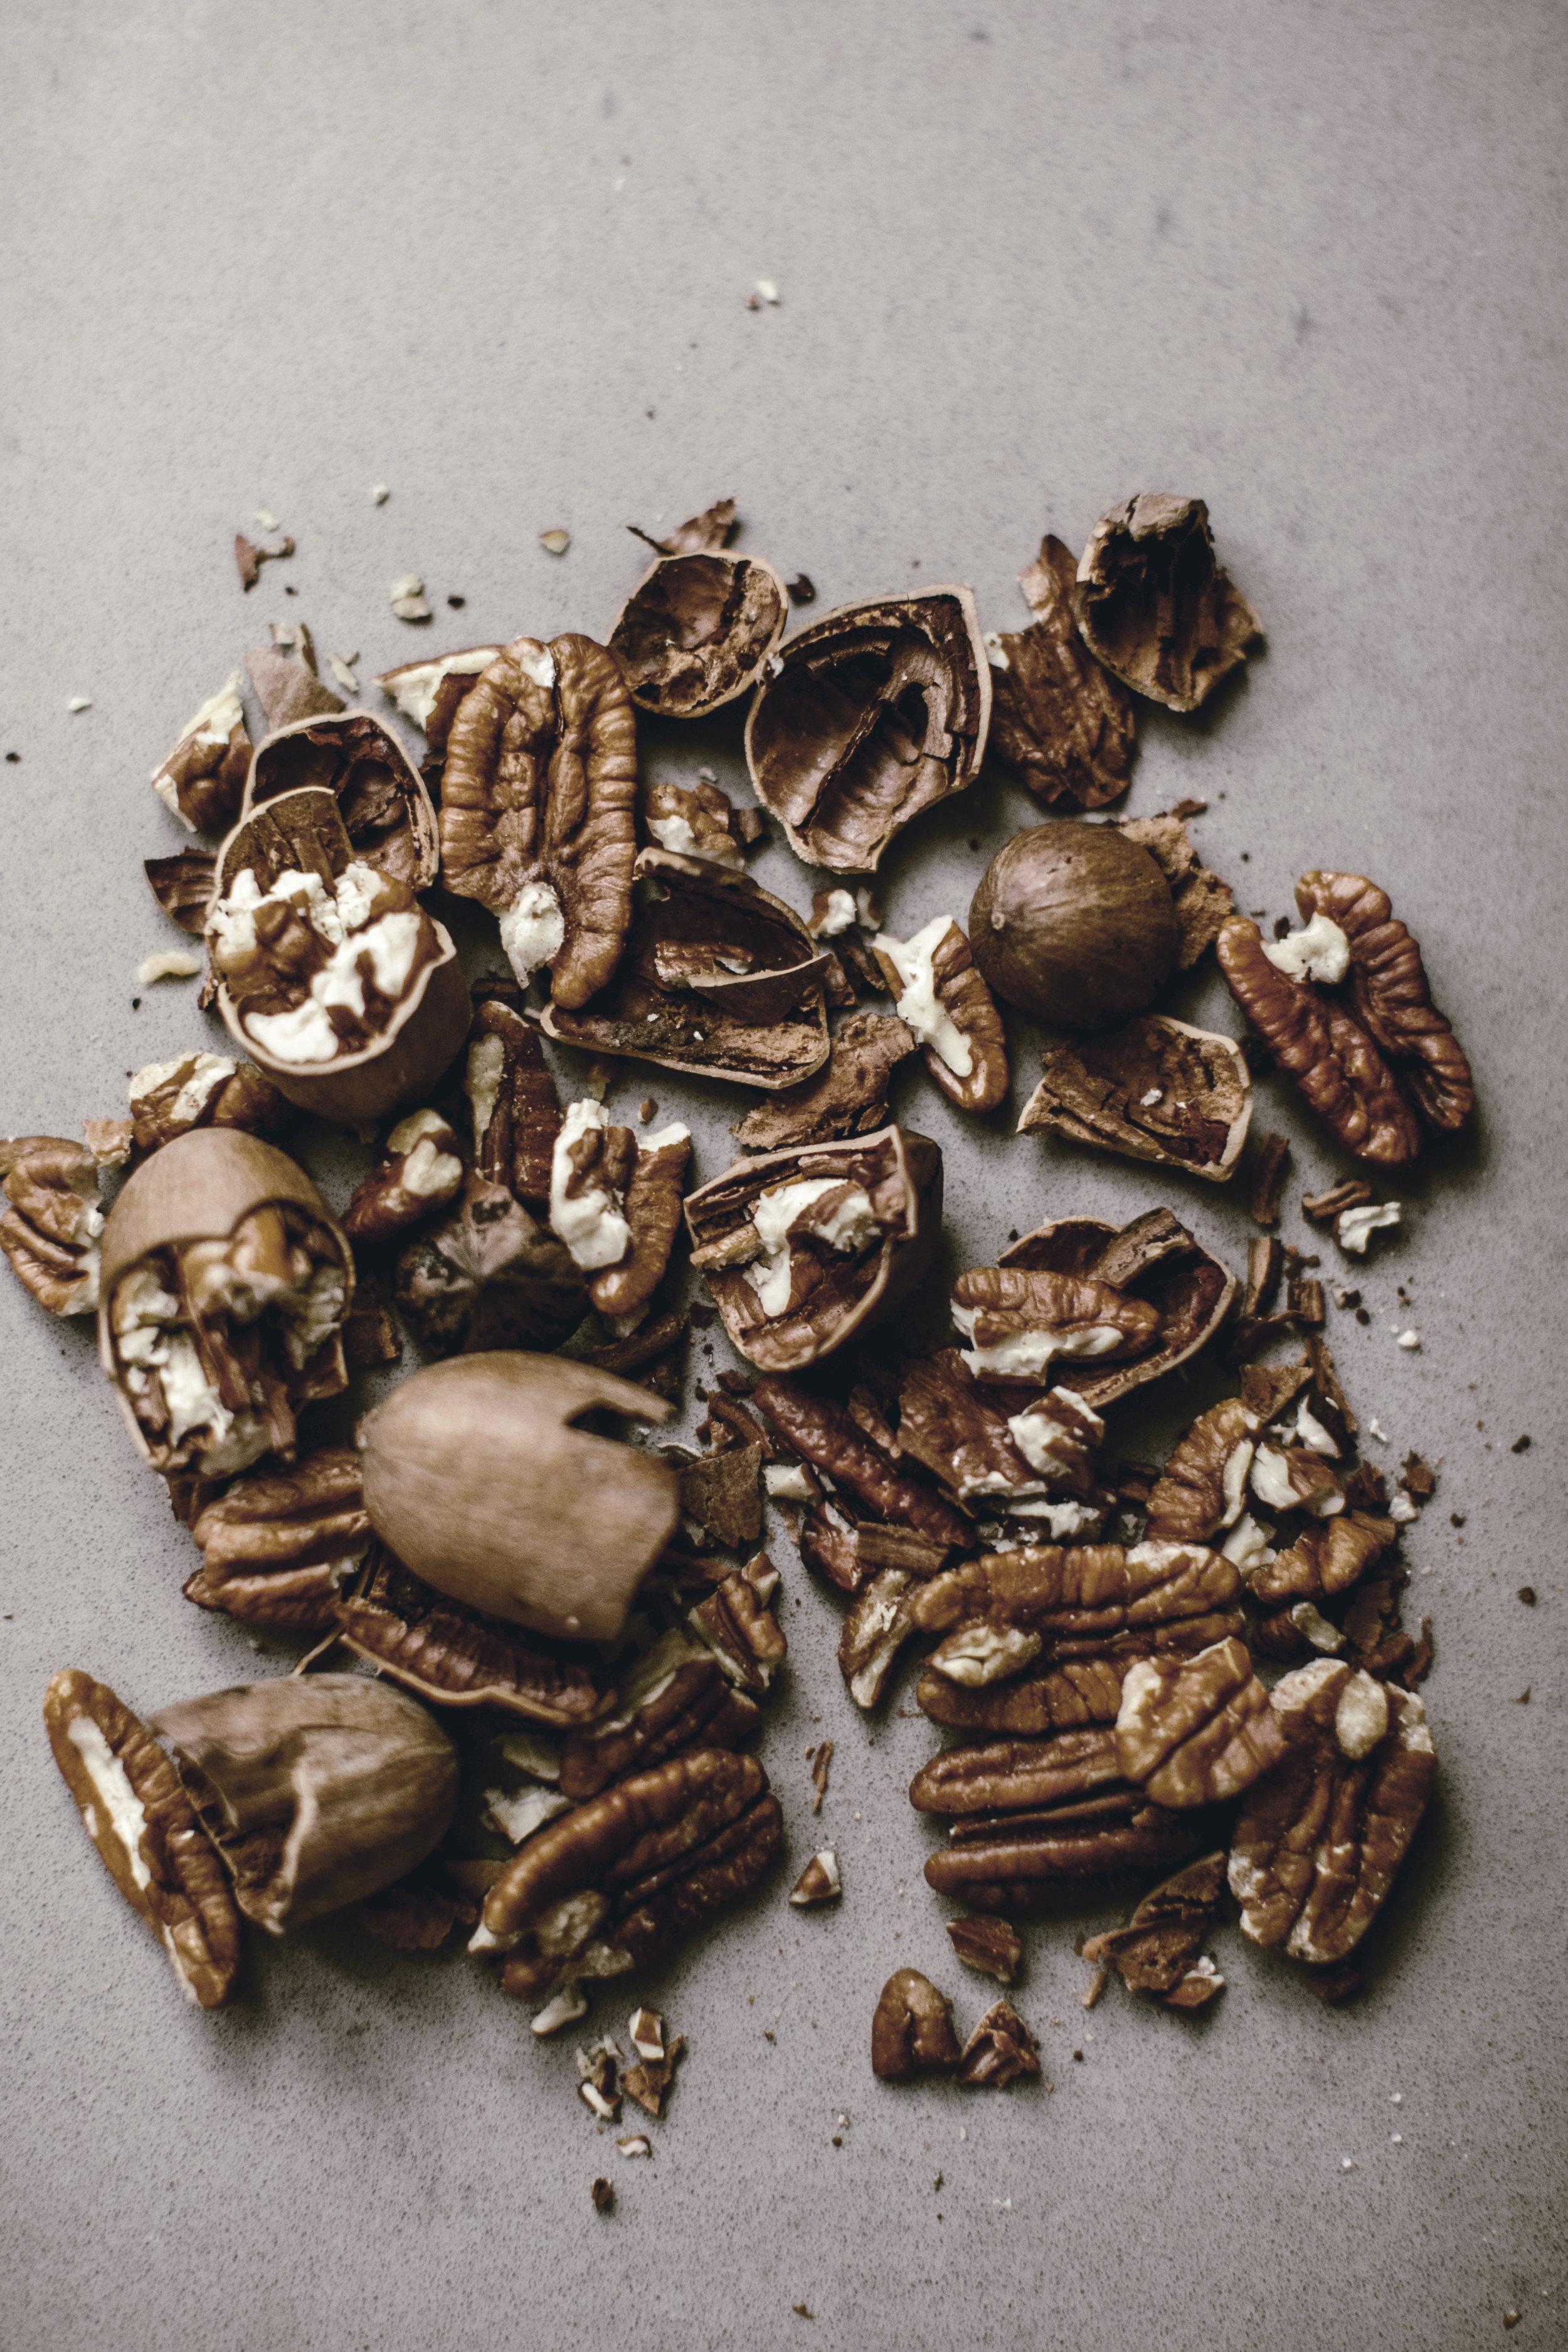 farm fresh cracked + shelled pecans